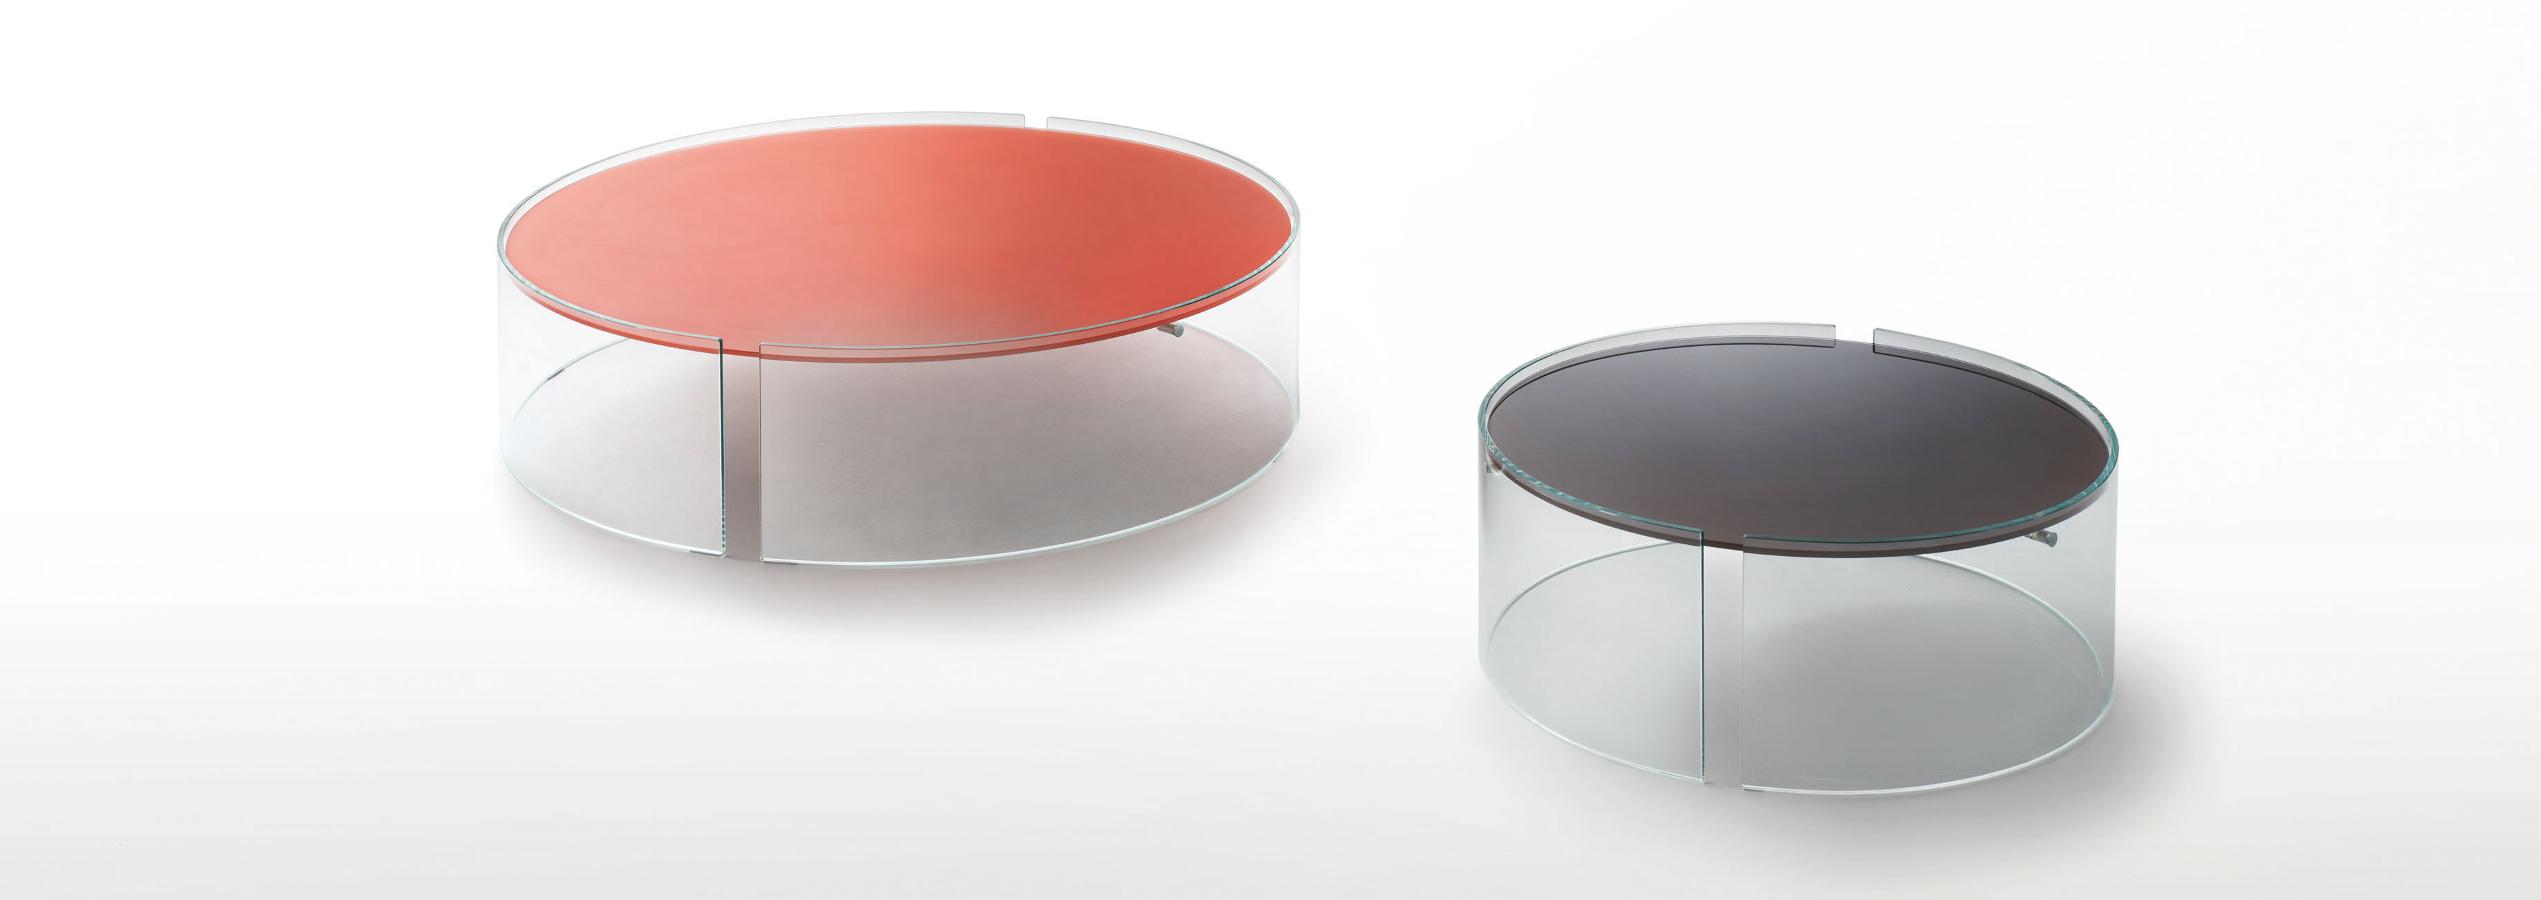 split-Couchtische-Glas-italia